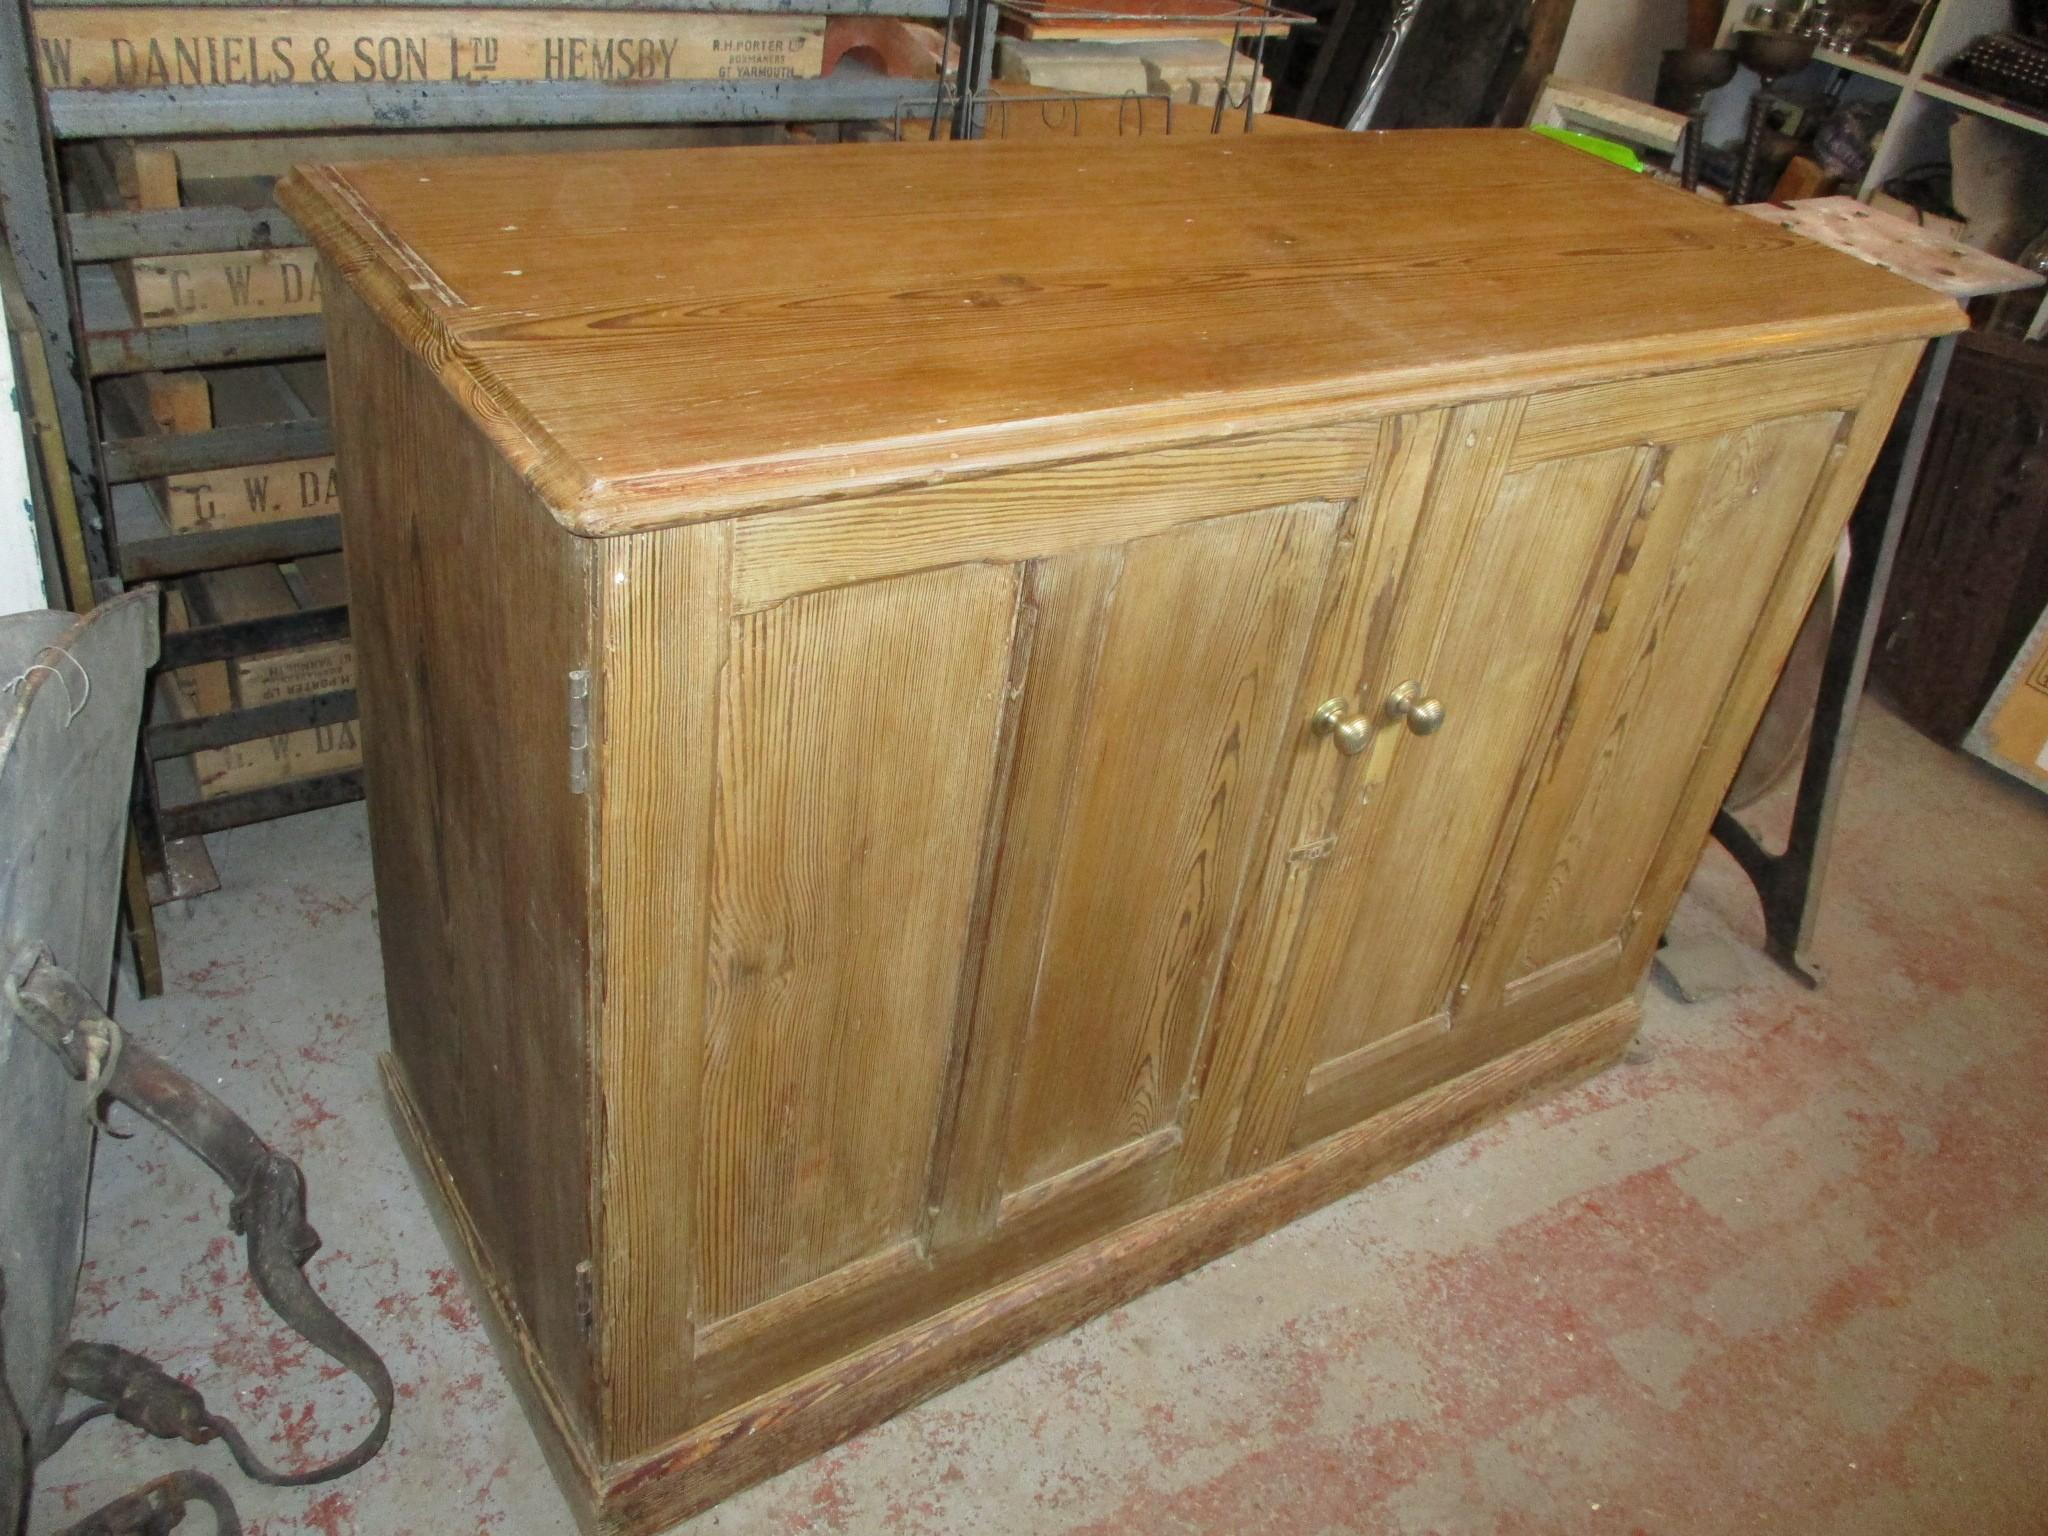 Cupboard - School pitch pine storage cupboard